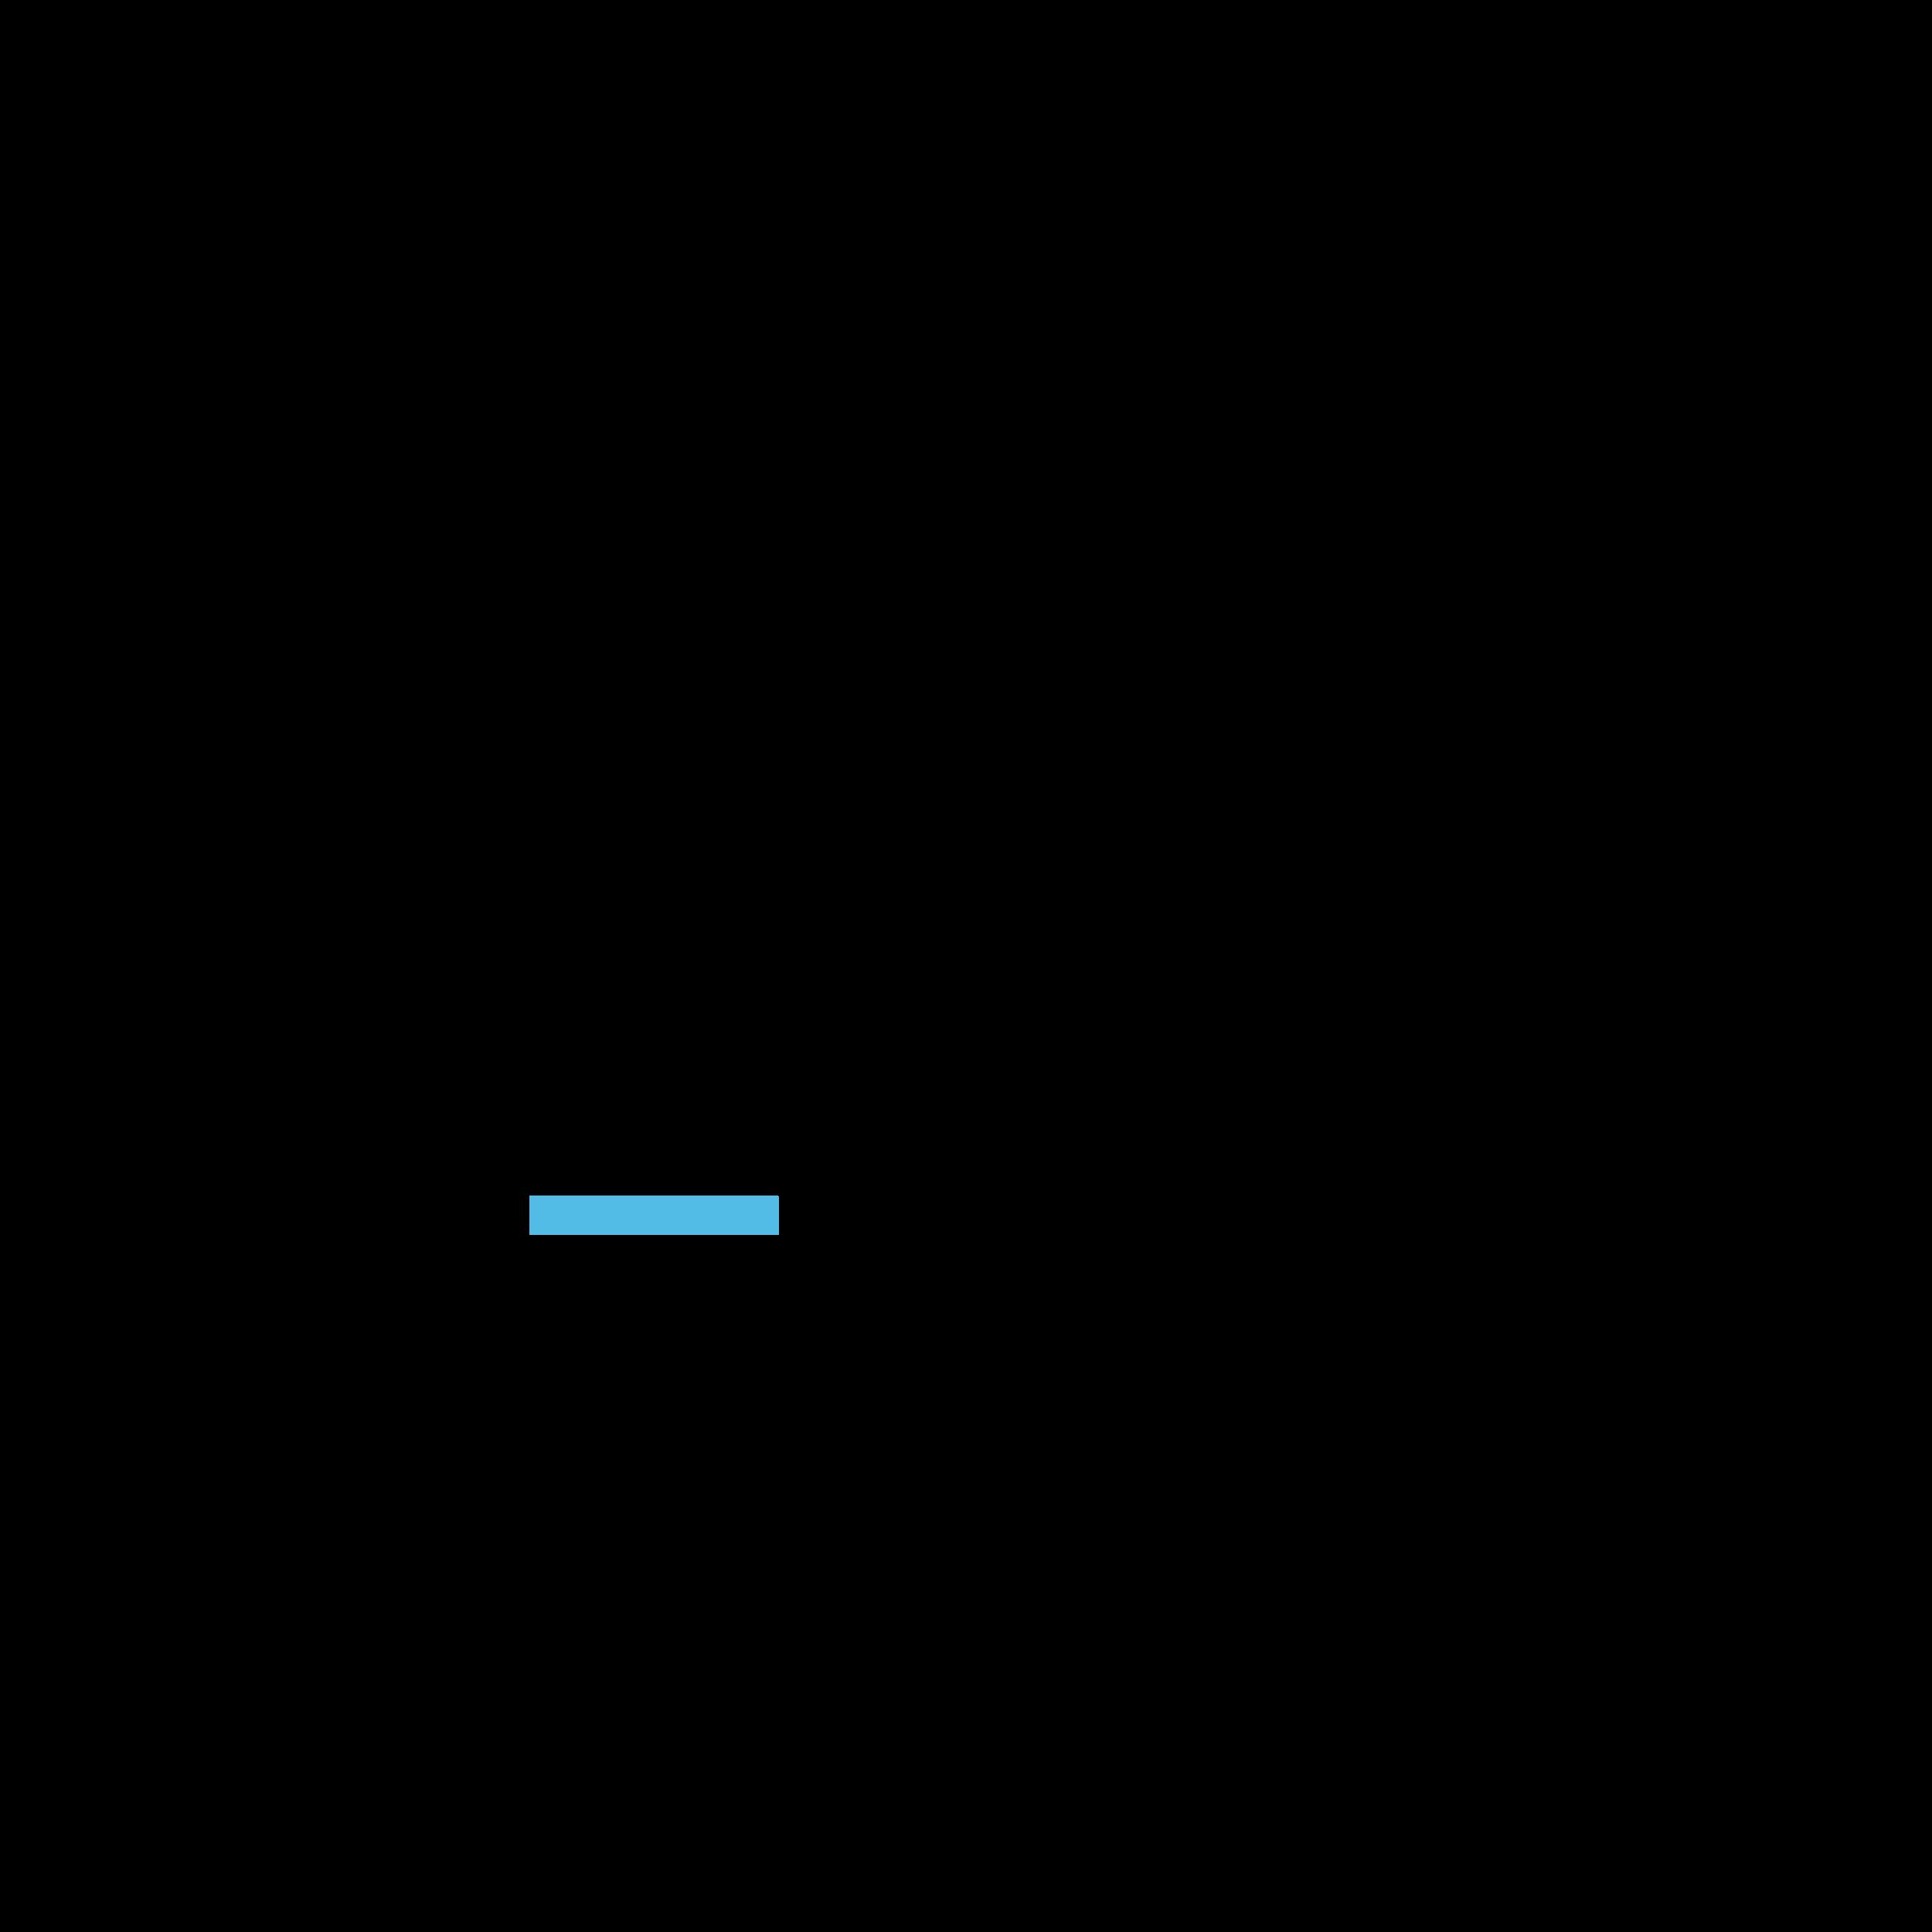 logo plesk